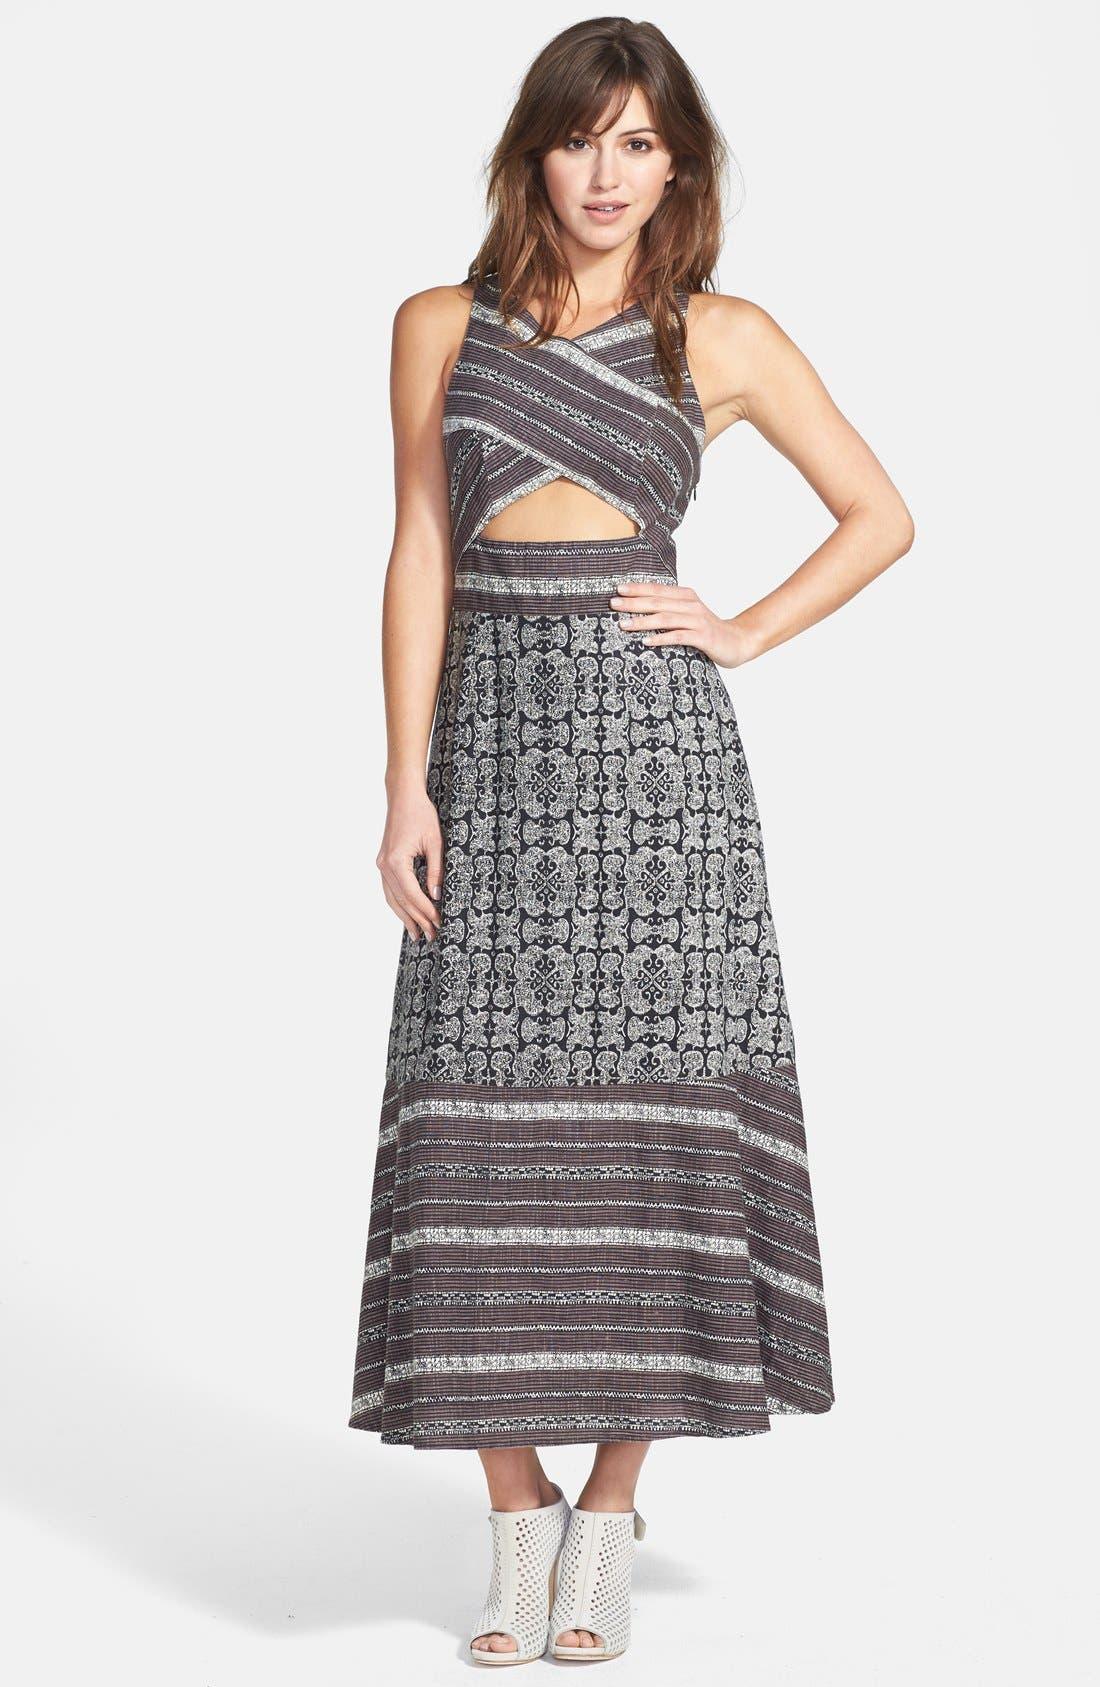 Alternate Image 1 Selected - Free People 'Tribal Tale' Cutout Mixed Print Midi Dress